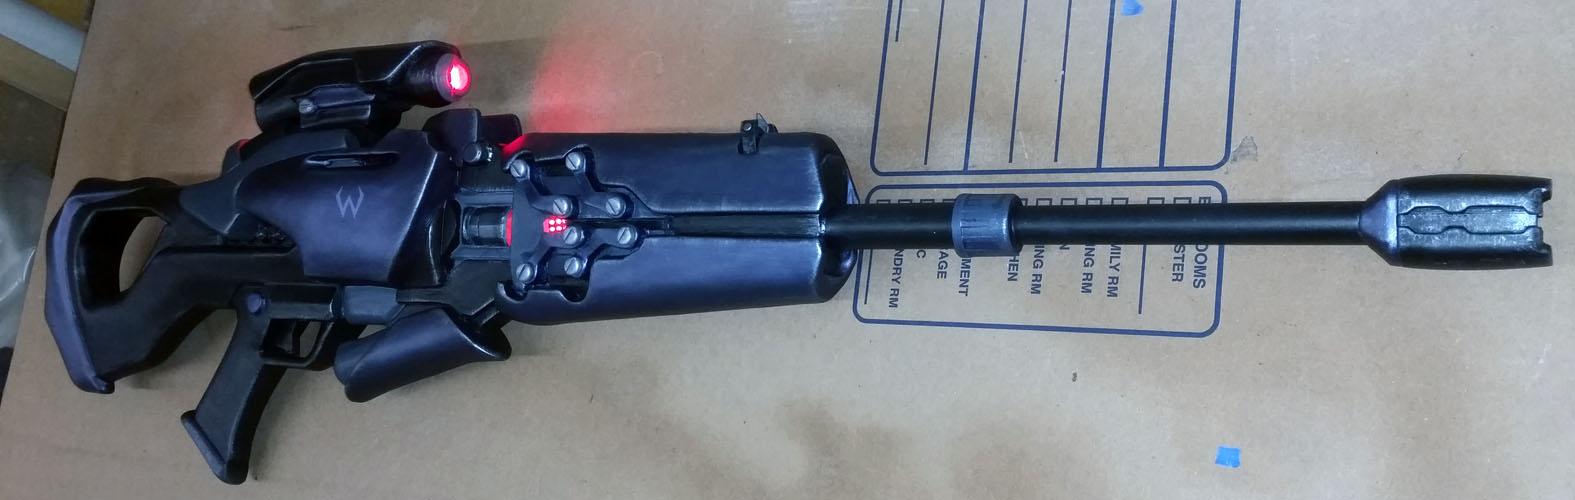 rifle 2-2